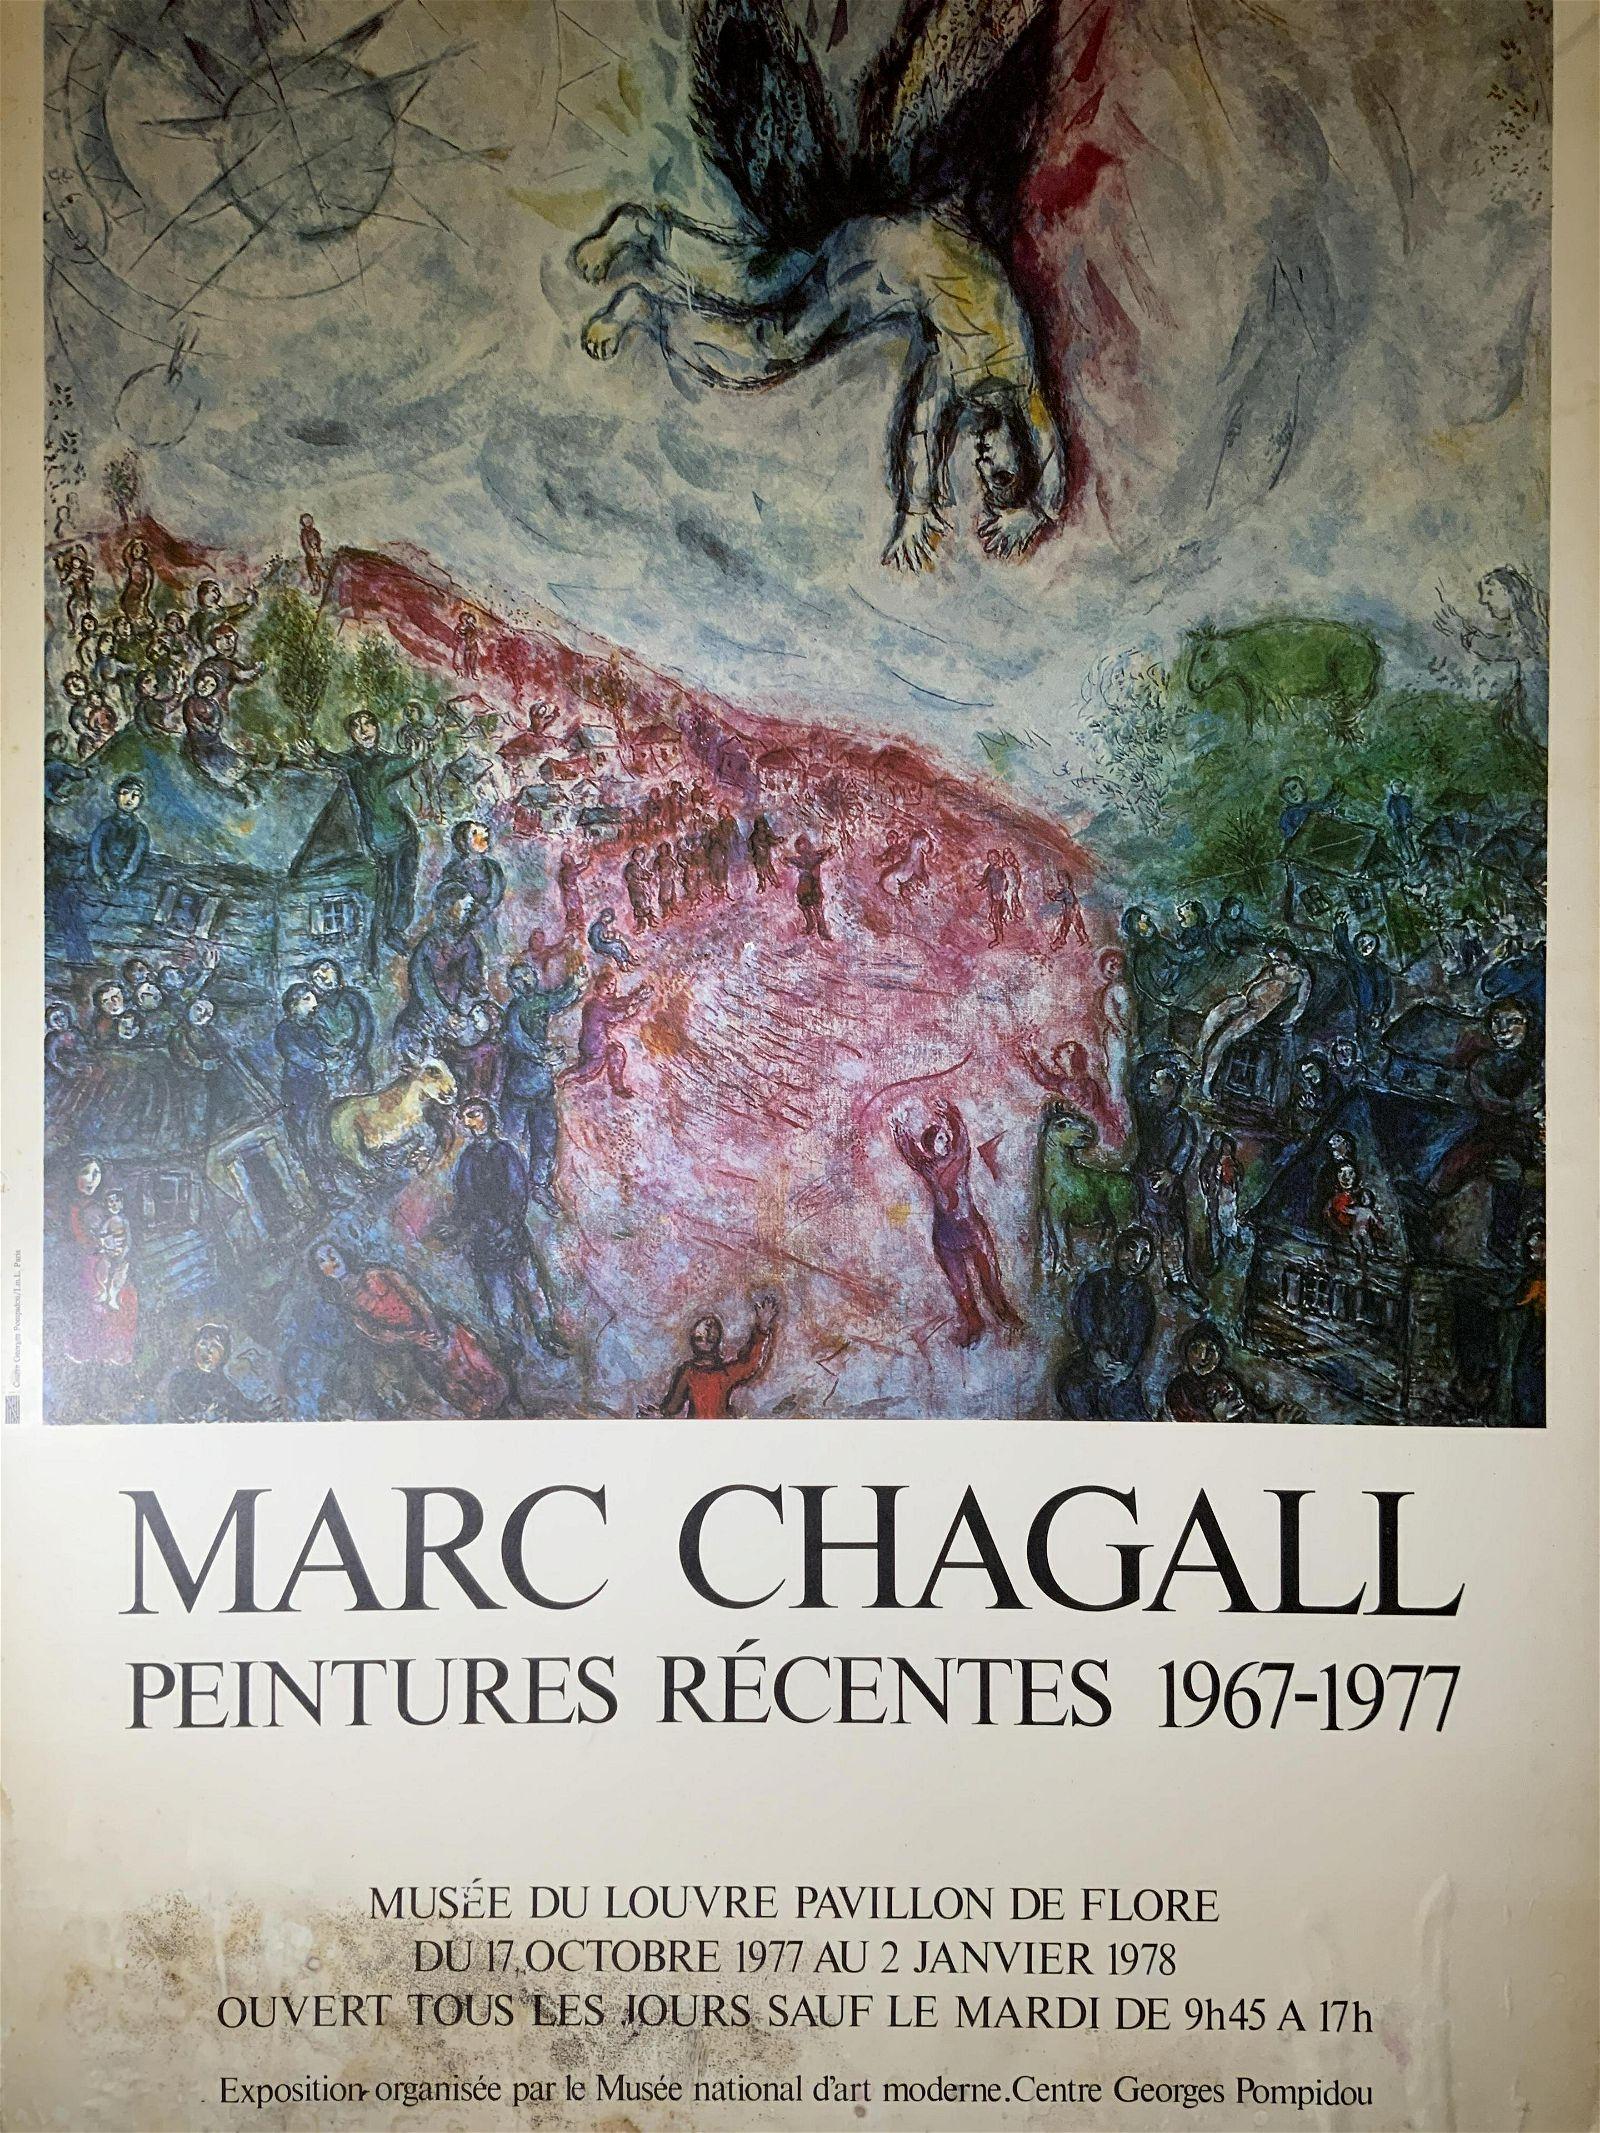 MARC CHAGALL Centre Pompidou Exhibition Poster